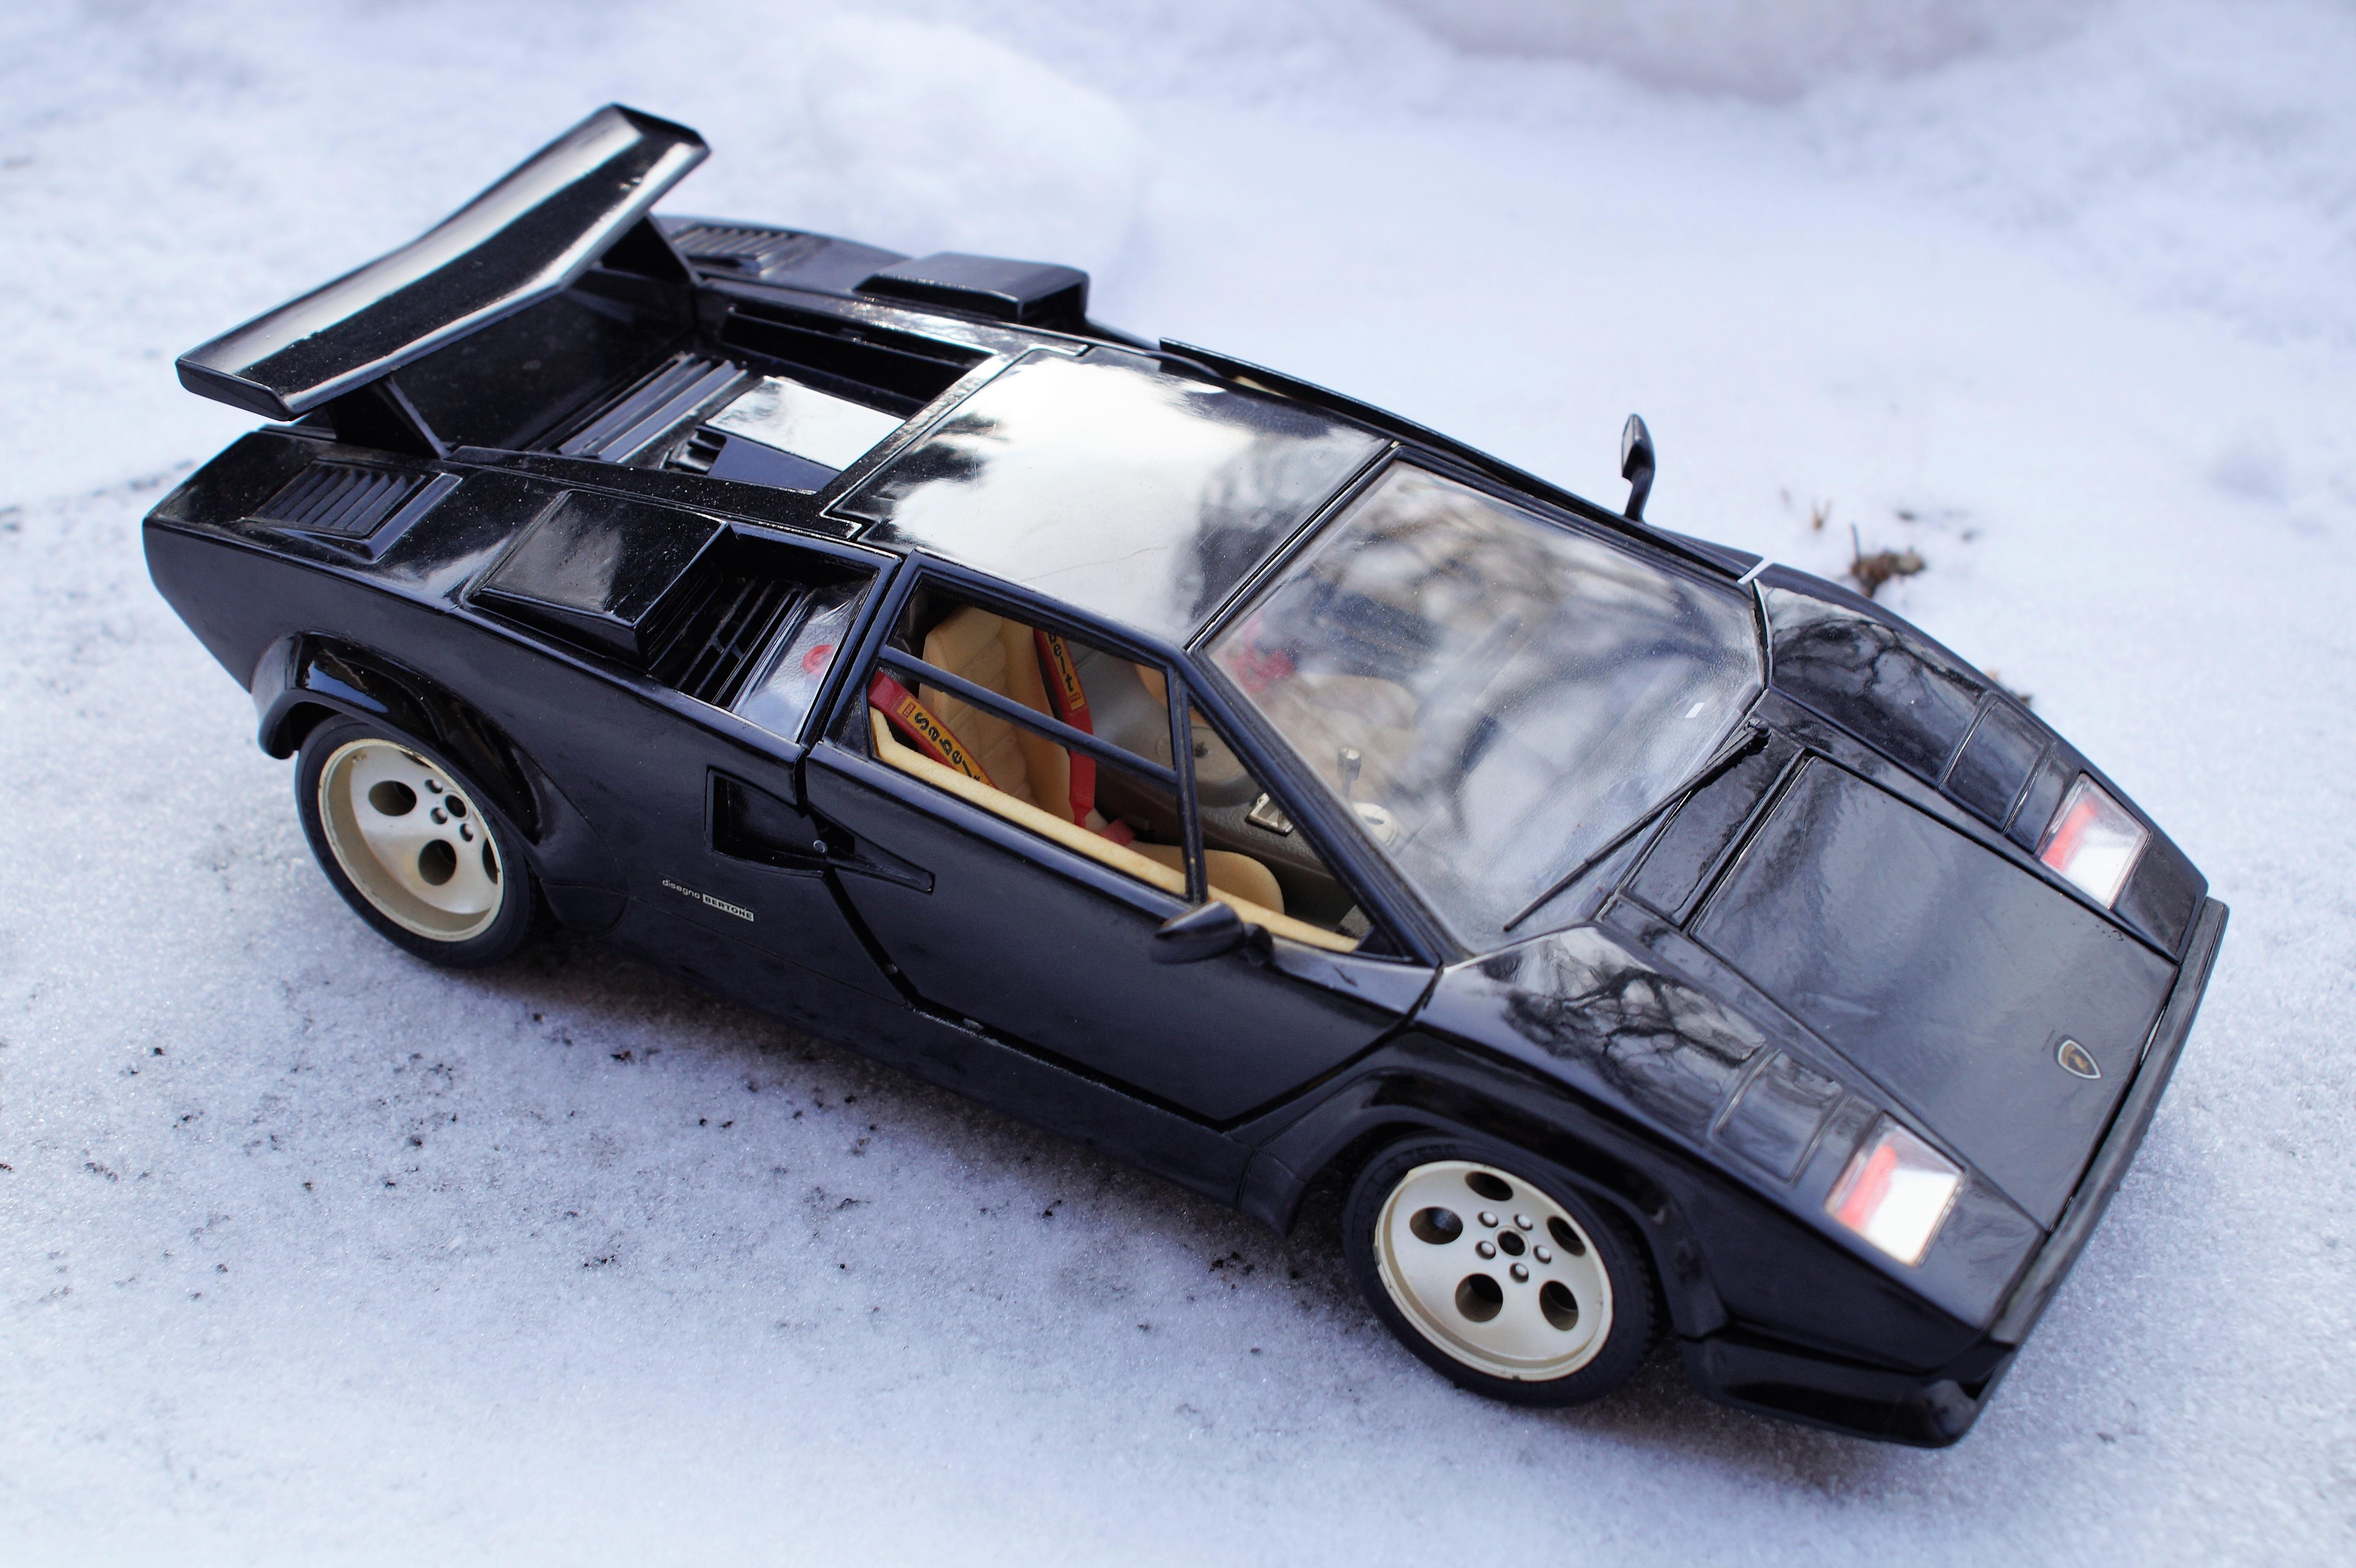 Car Model Vehicle Auto Black Toy Automotive Sports Car Race Car Supercar  Toys Oldtimer Lamborghini Vehicles